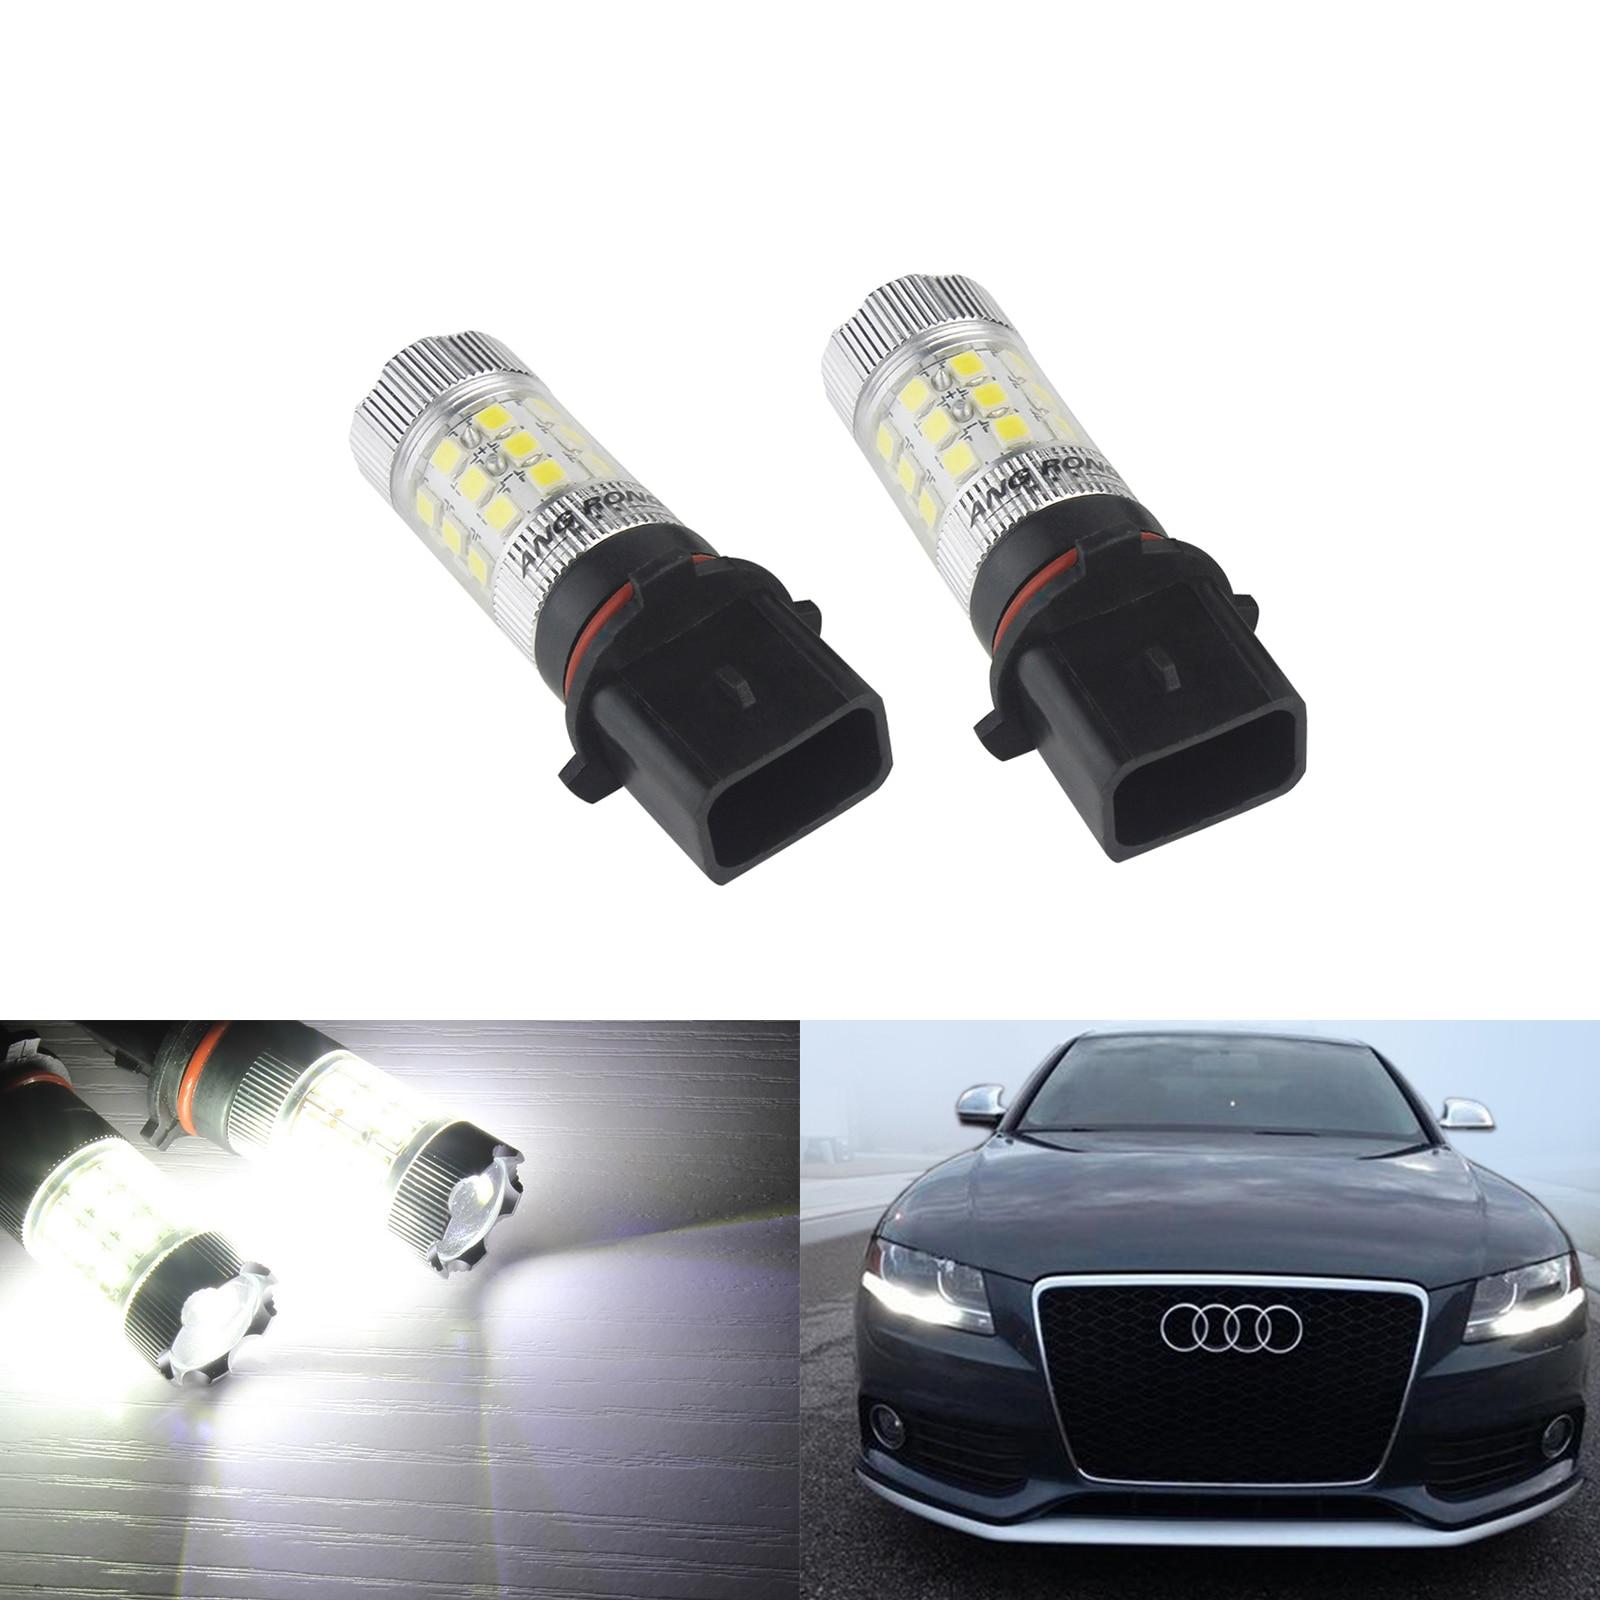 ANGRONG 2x P13W PSX26W Birne 30 SMD LED Projektor Nebel Lampe Tagfahrlicht DRL Weiß (CA268x2)